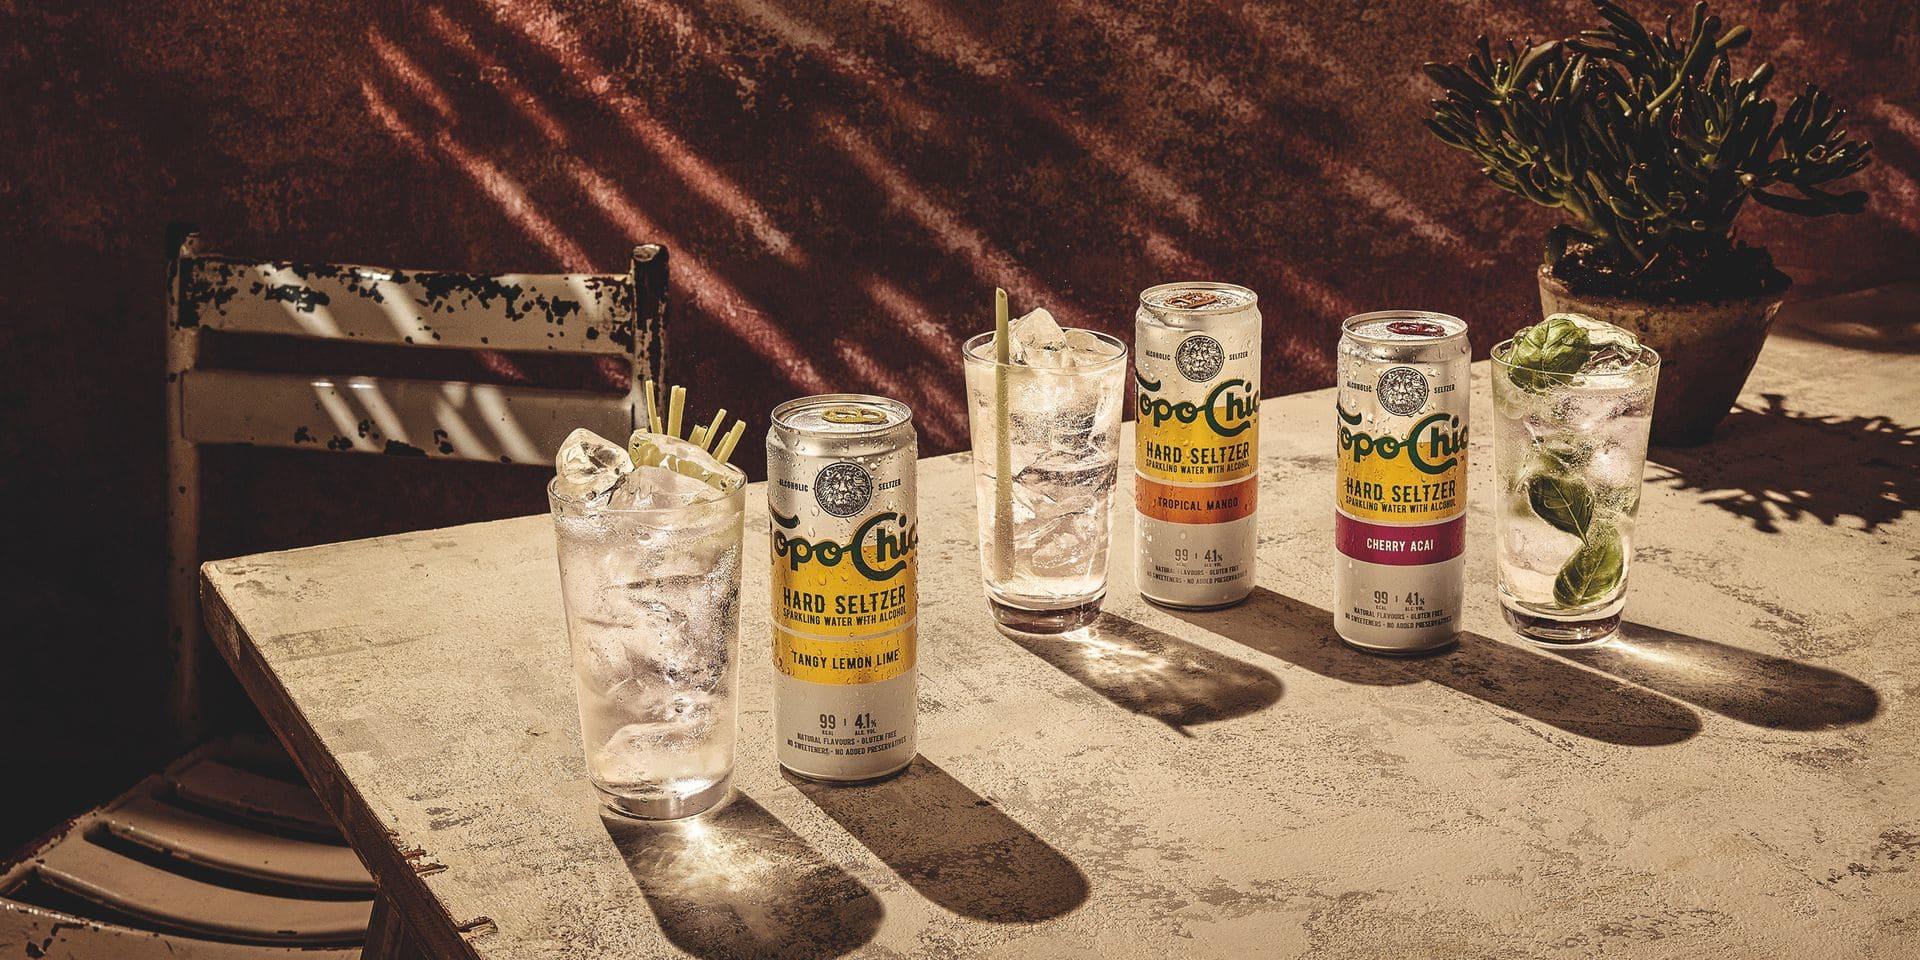 Topo Chico proposera trois saveurs : Tangy Lemon Lime, Tropical Mango et Cherry Açaí.